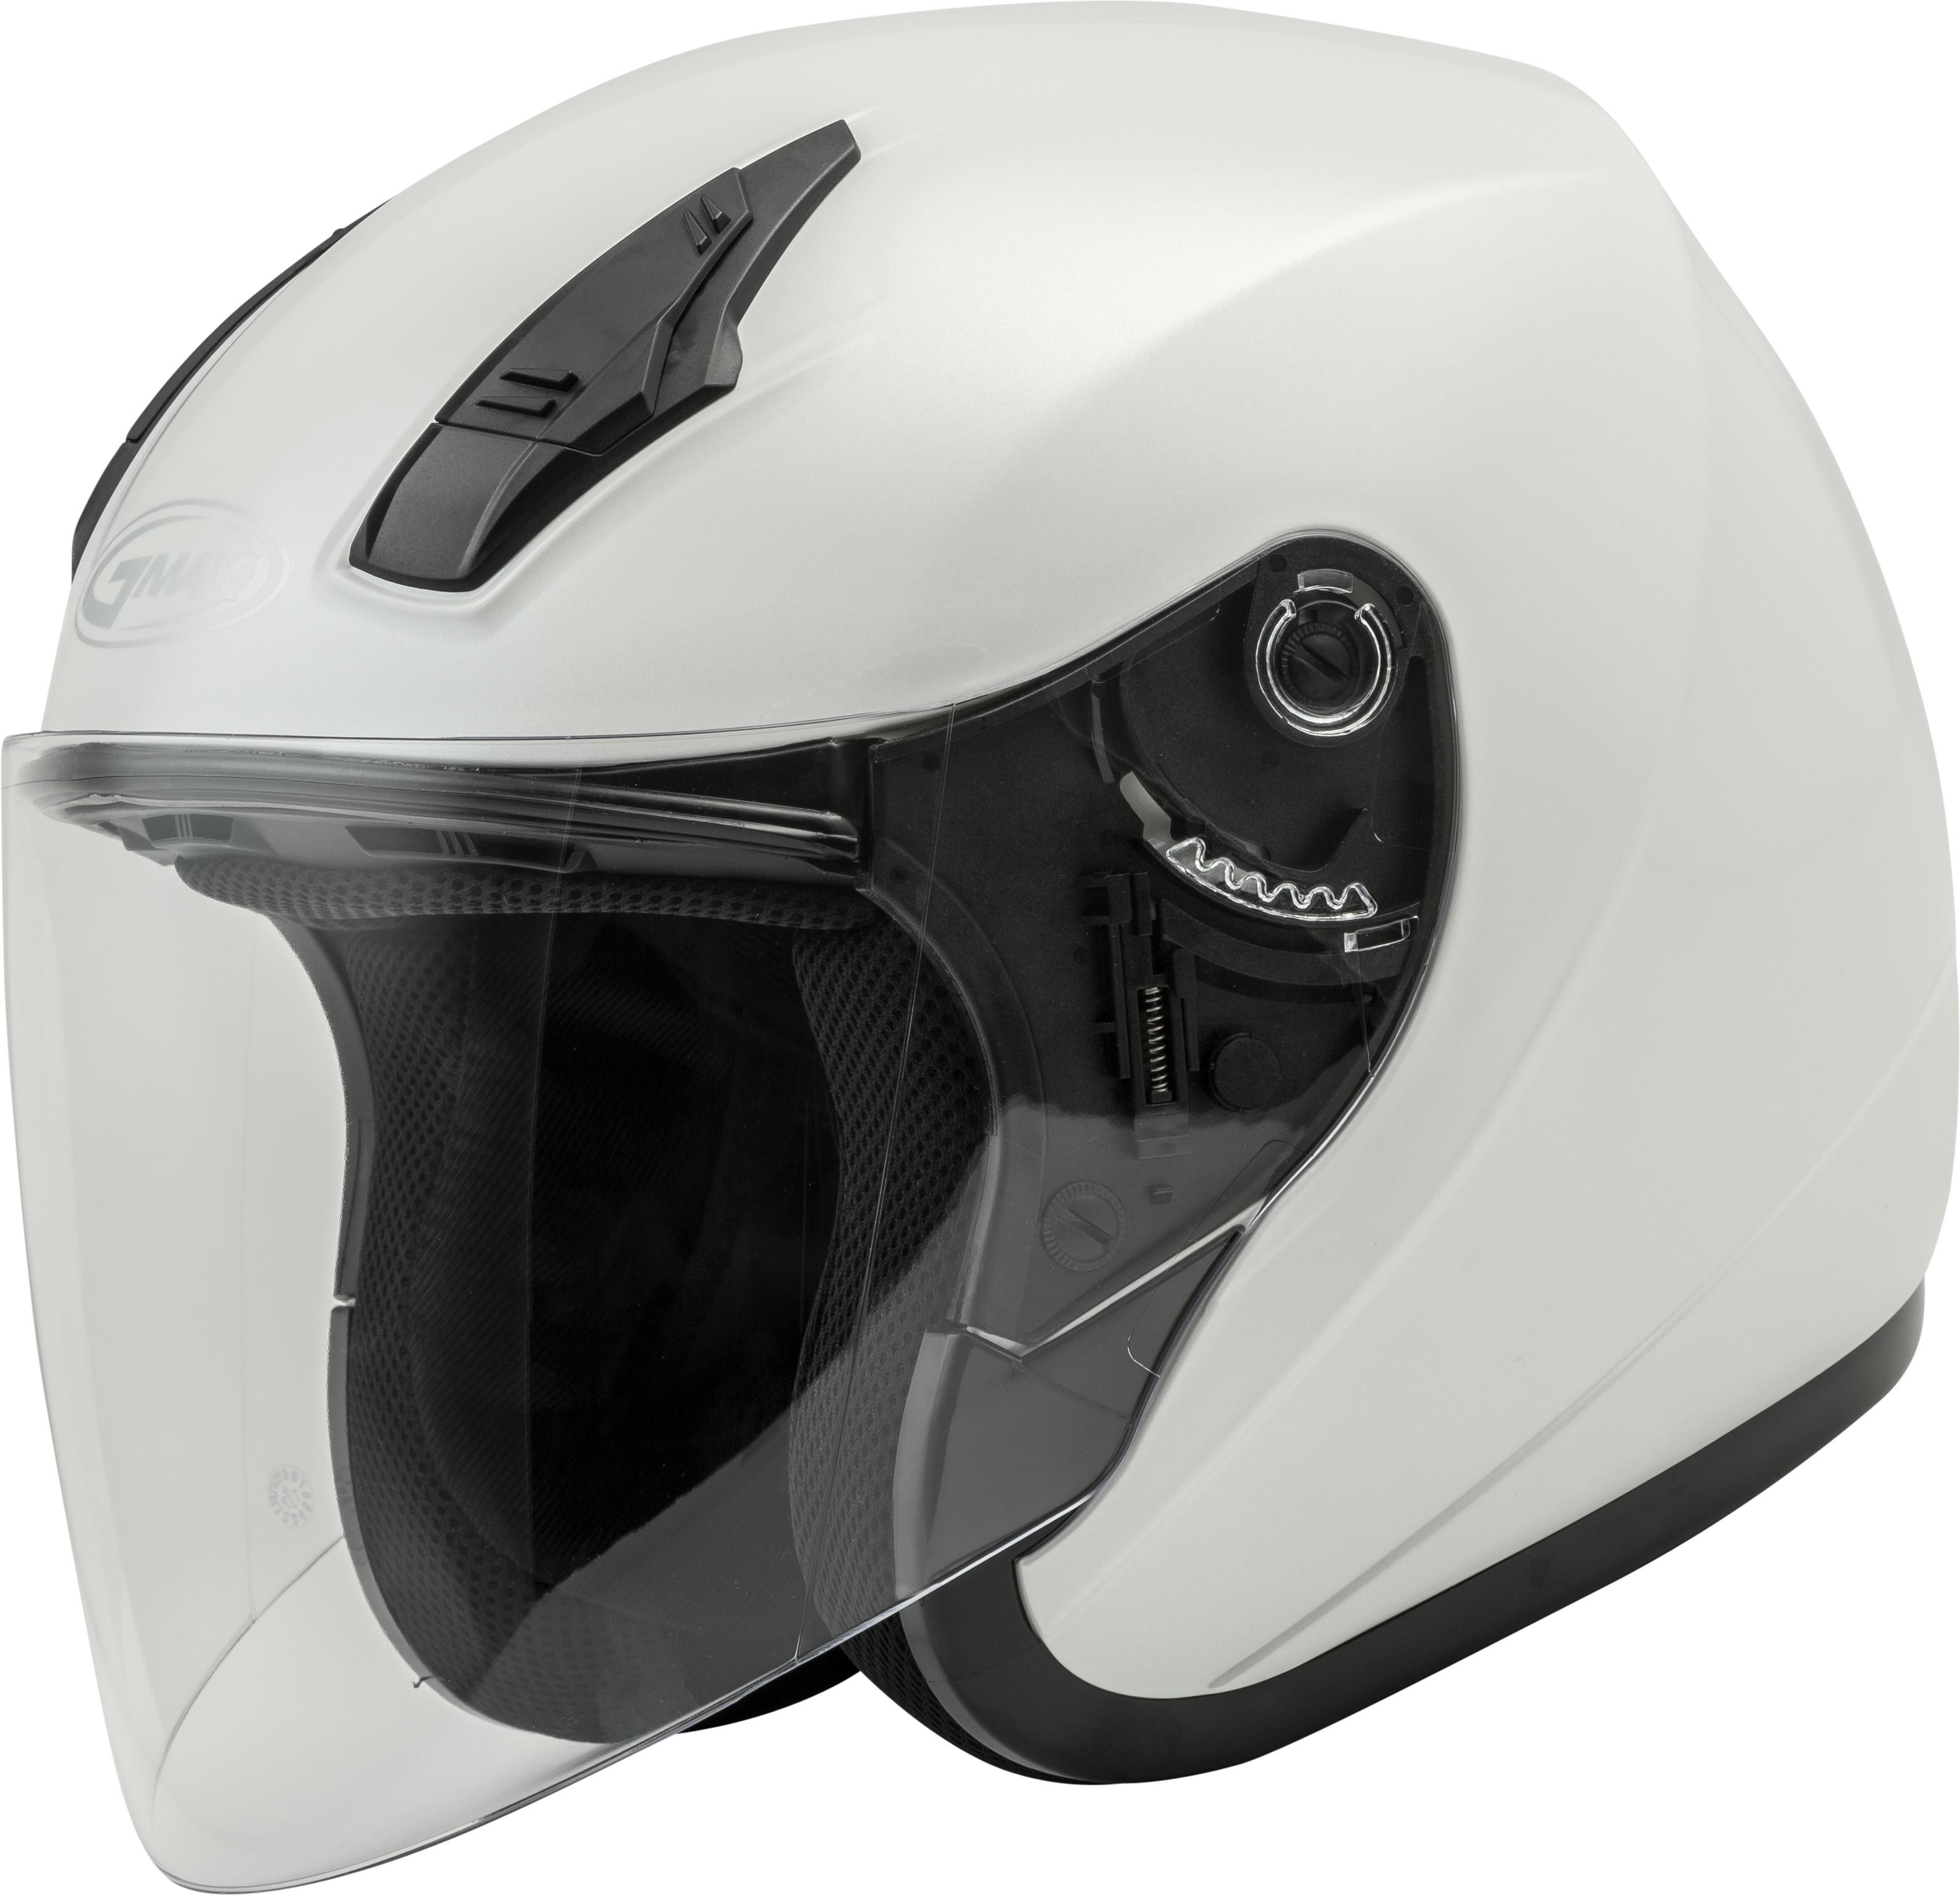 Dark Silver Choose Size GMAX OF-17 Open-Face Motorcycle Helmet